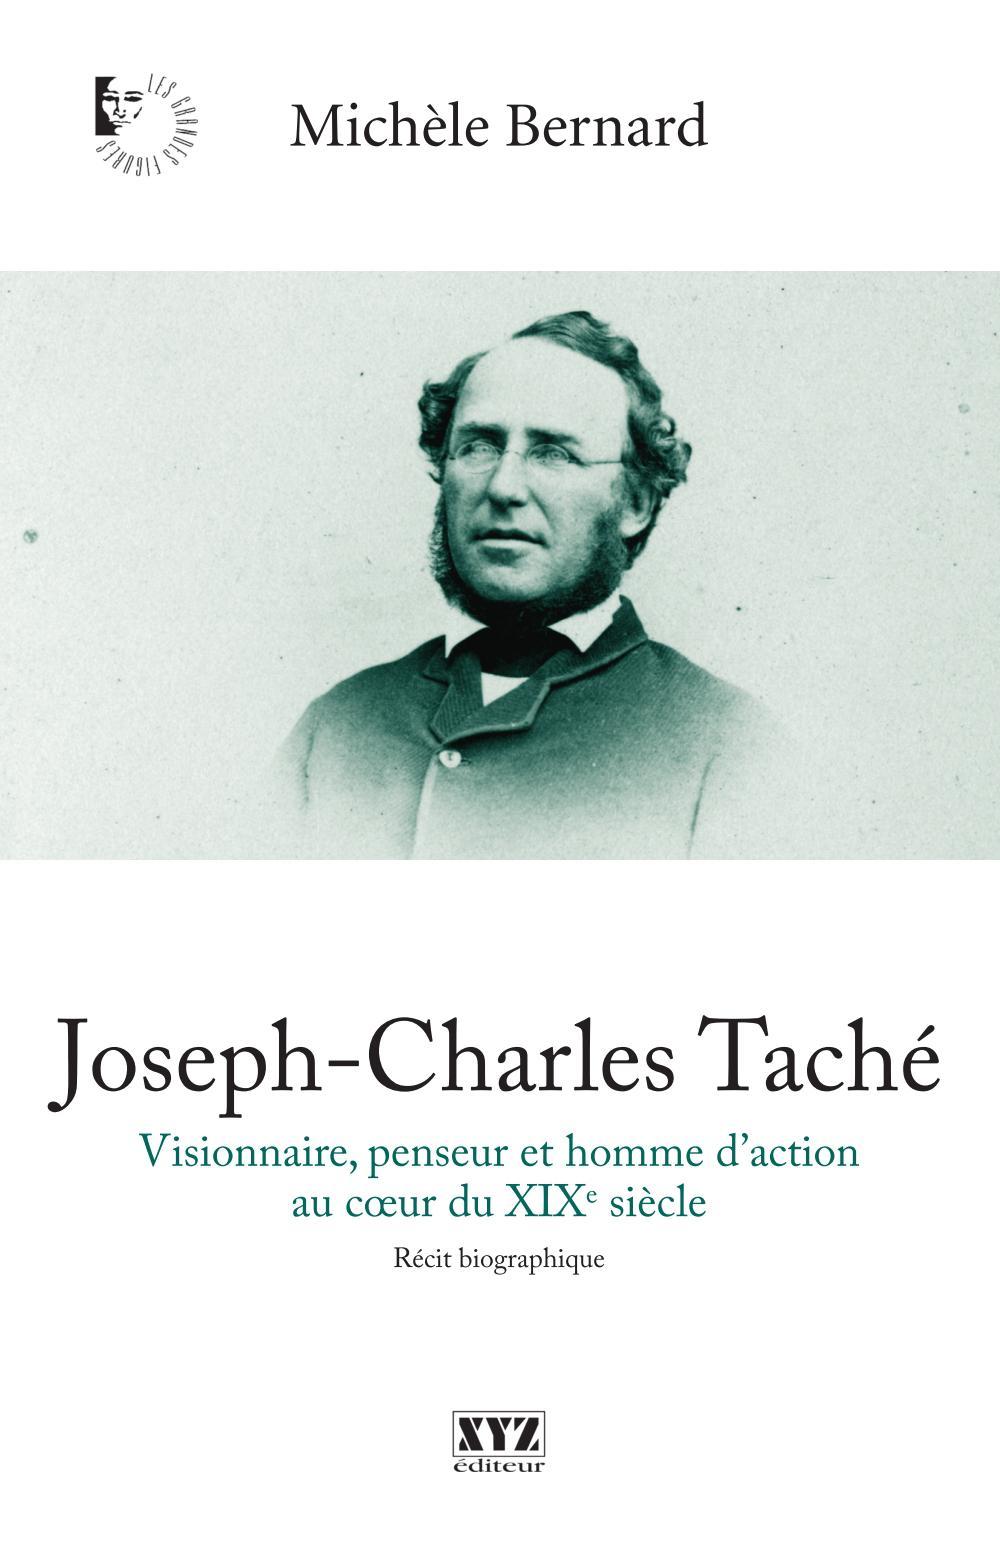 Joseph-Charles Taché